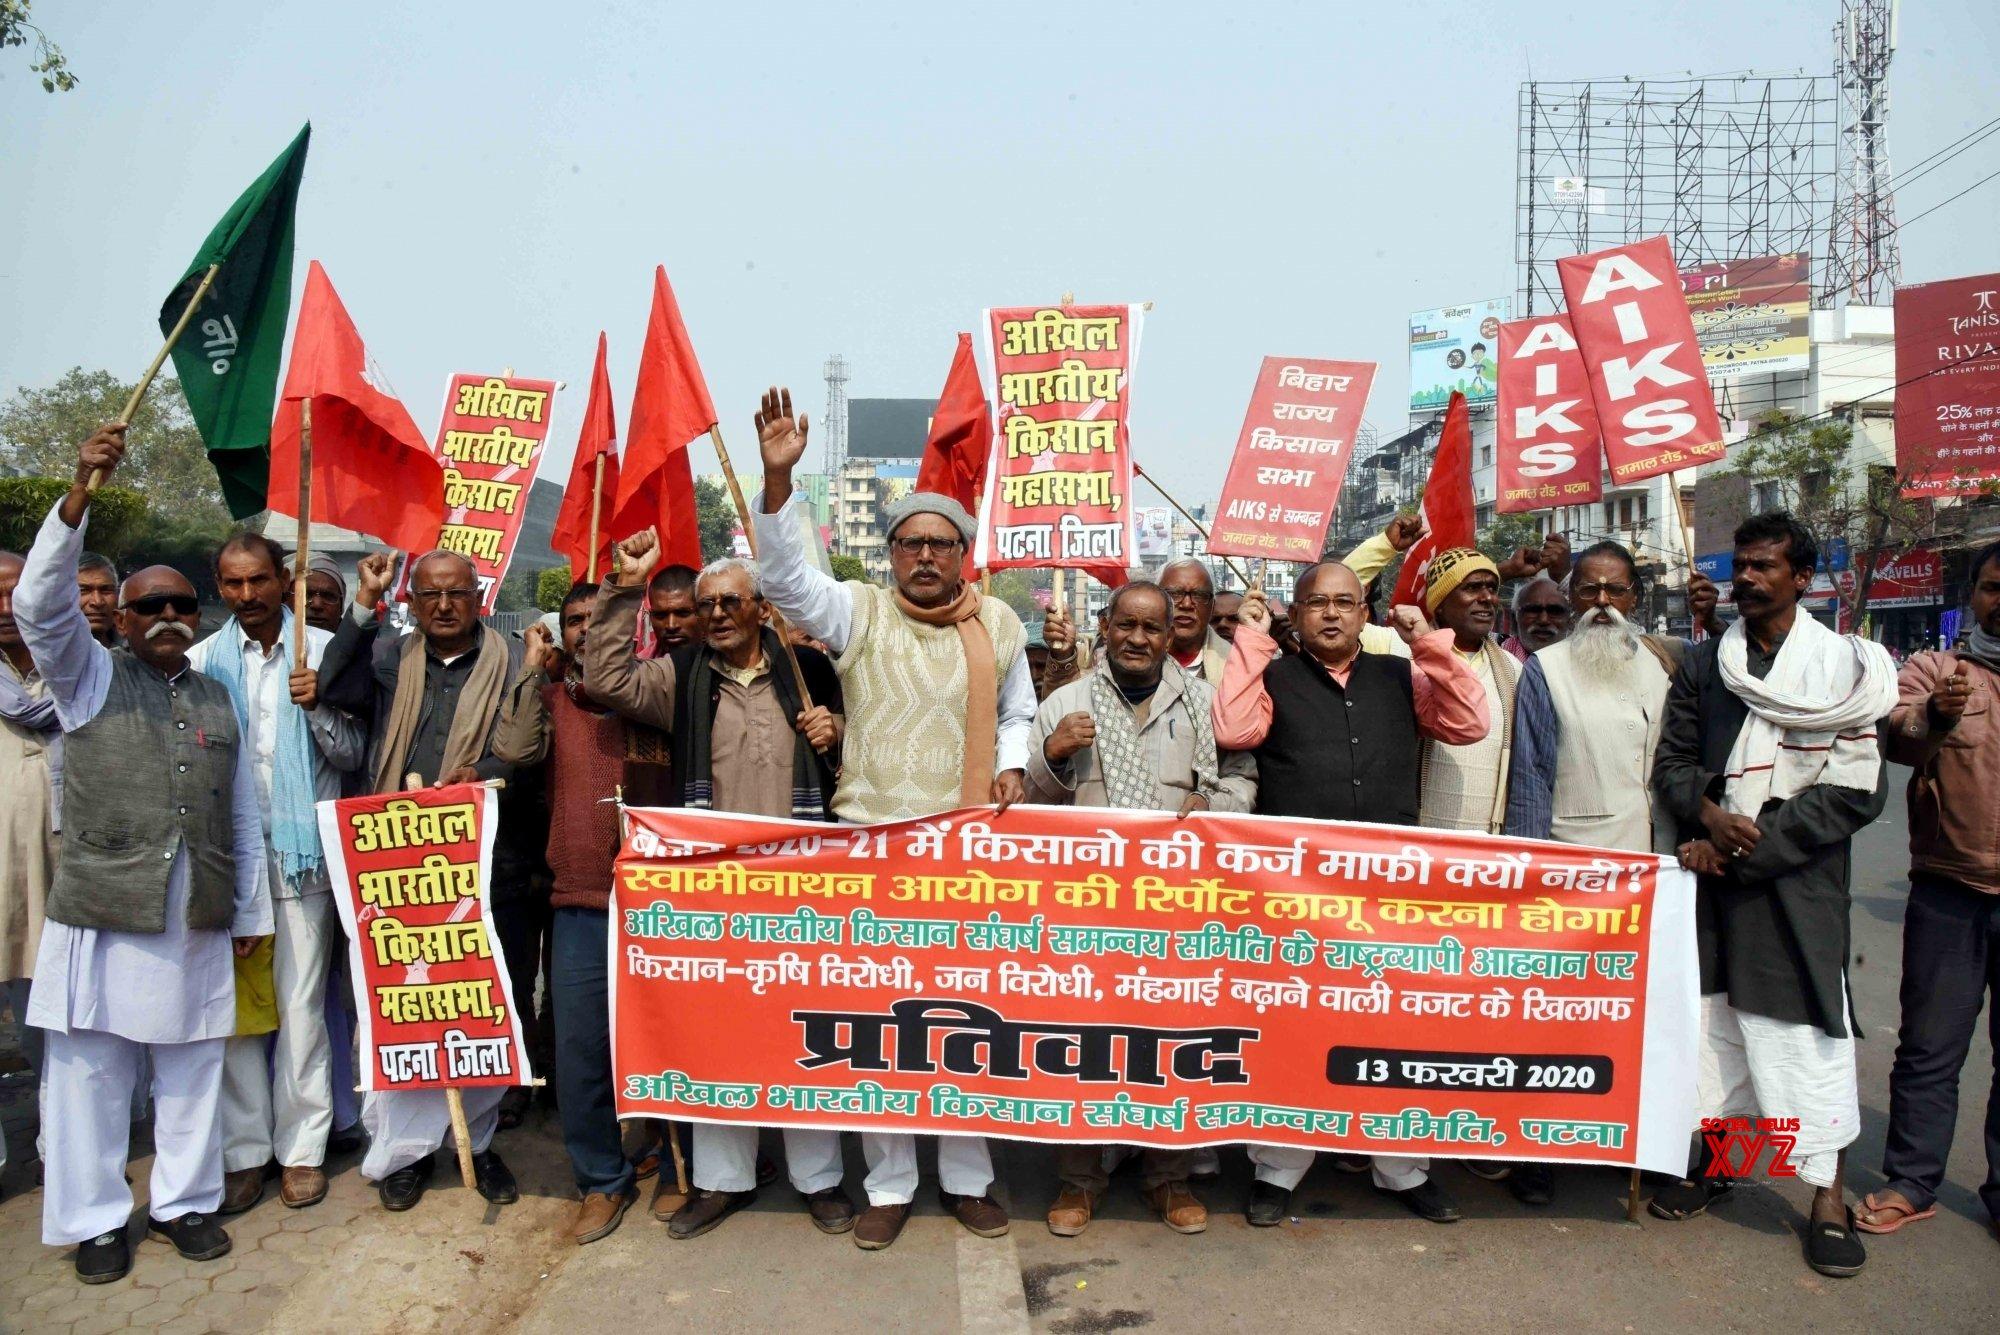 Patna: All India Kisan Sabha protest #Gallery